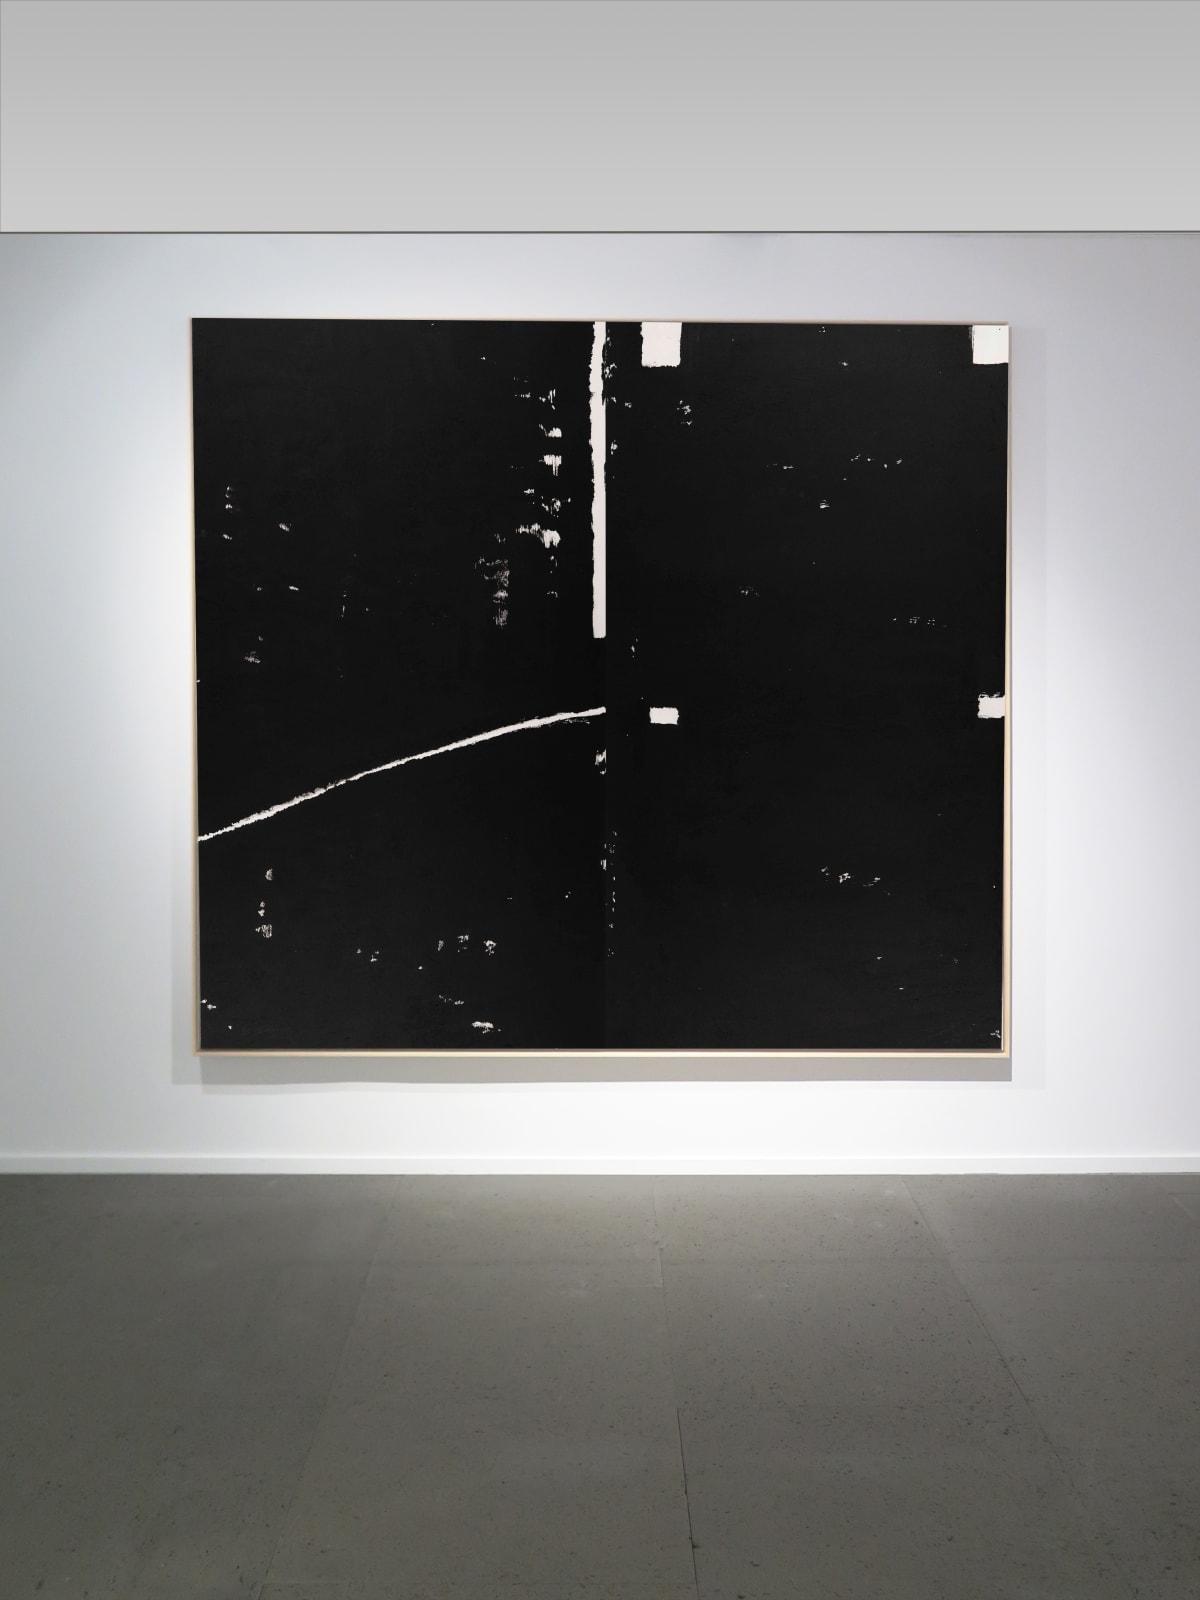 Galerie Du Monde Cn Liew Solo Exhibition Installation View 8